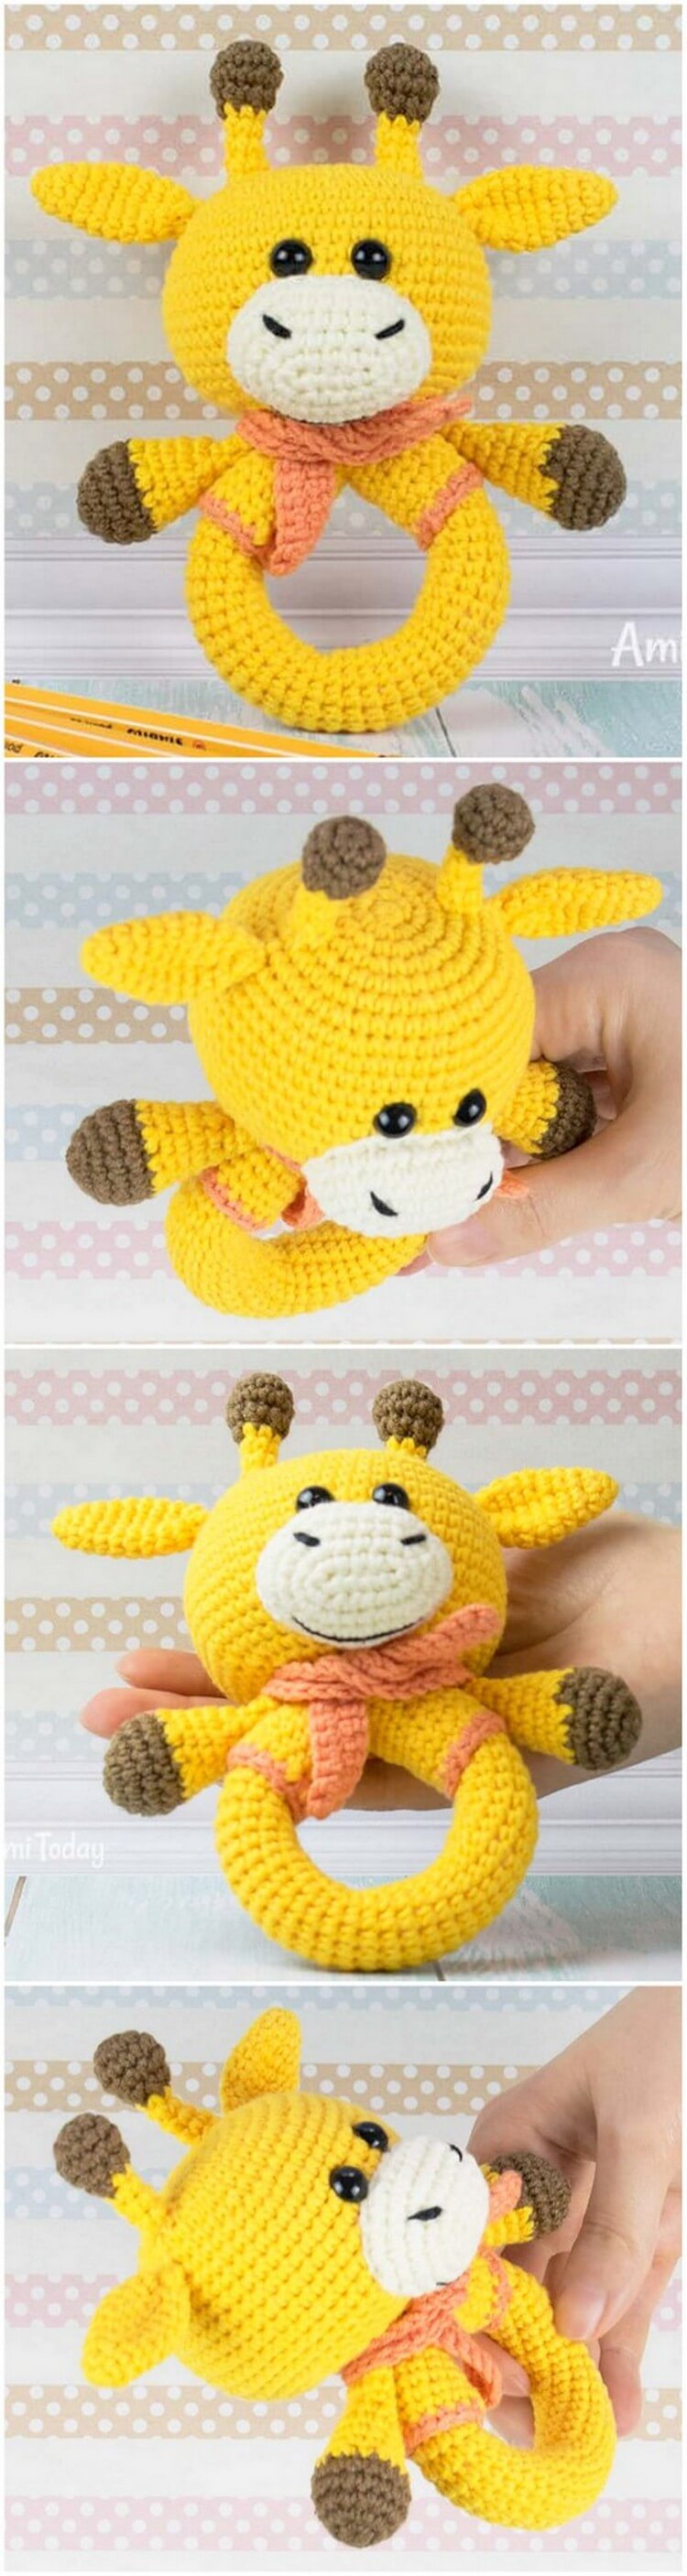 Crochet Amigurumi Pattern (51)